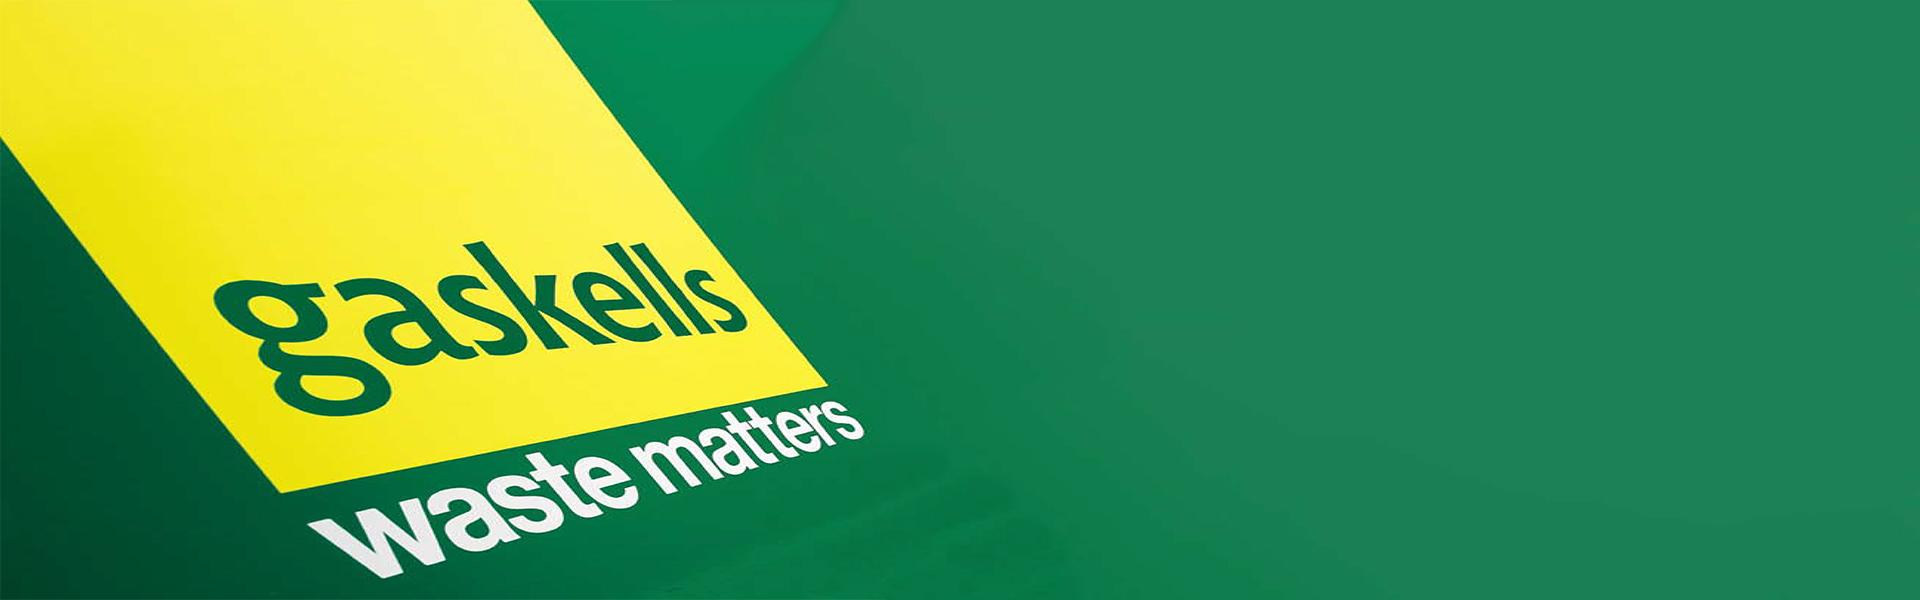 Gaskells | Waste Matters